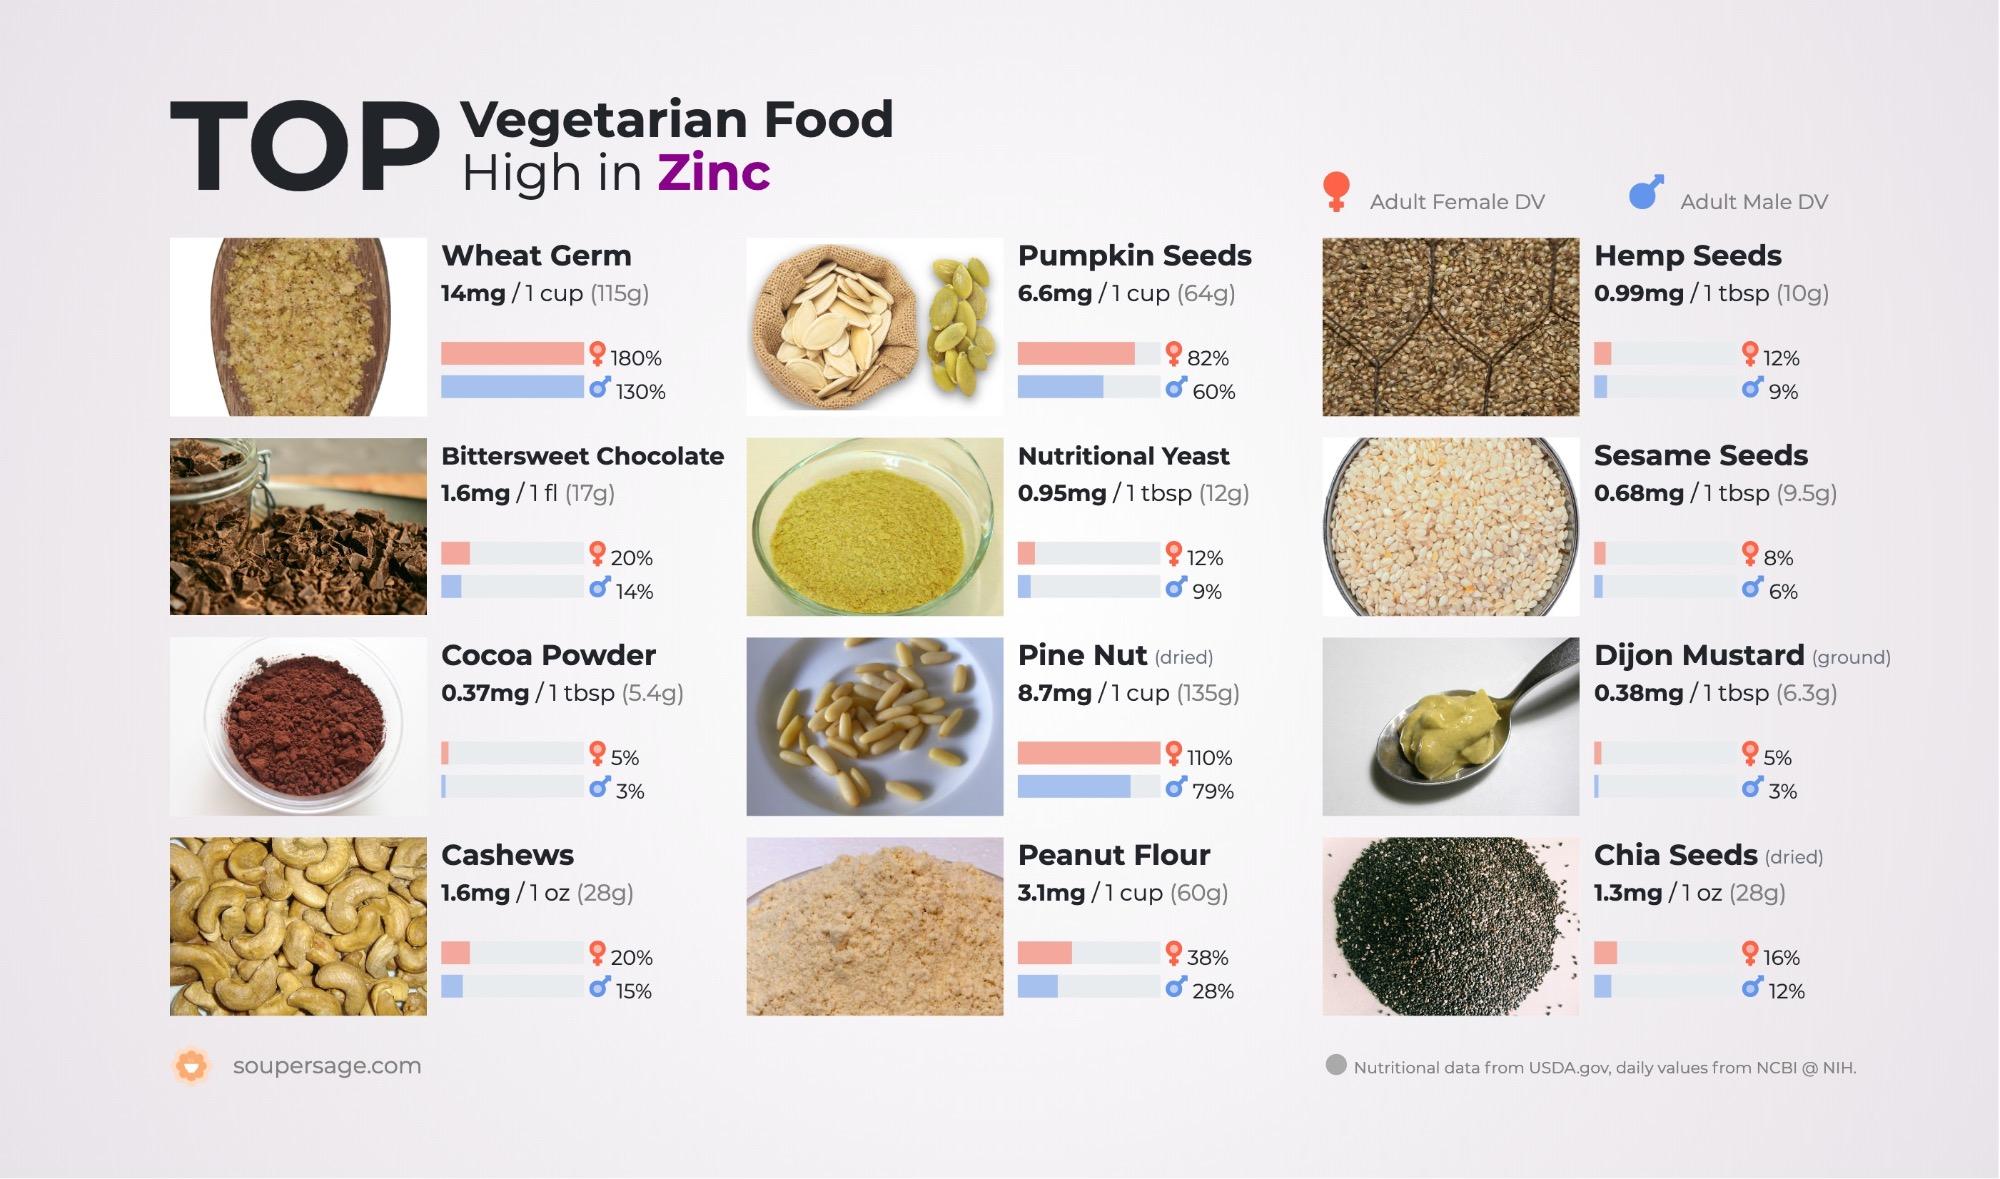 image of Top Vegetarian Food High in Zinc